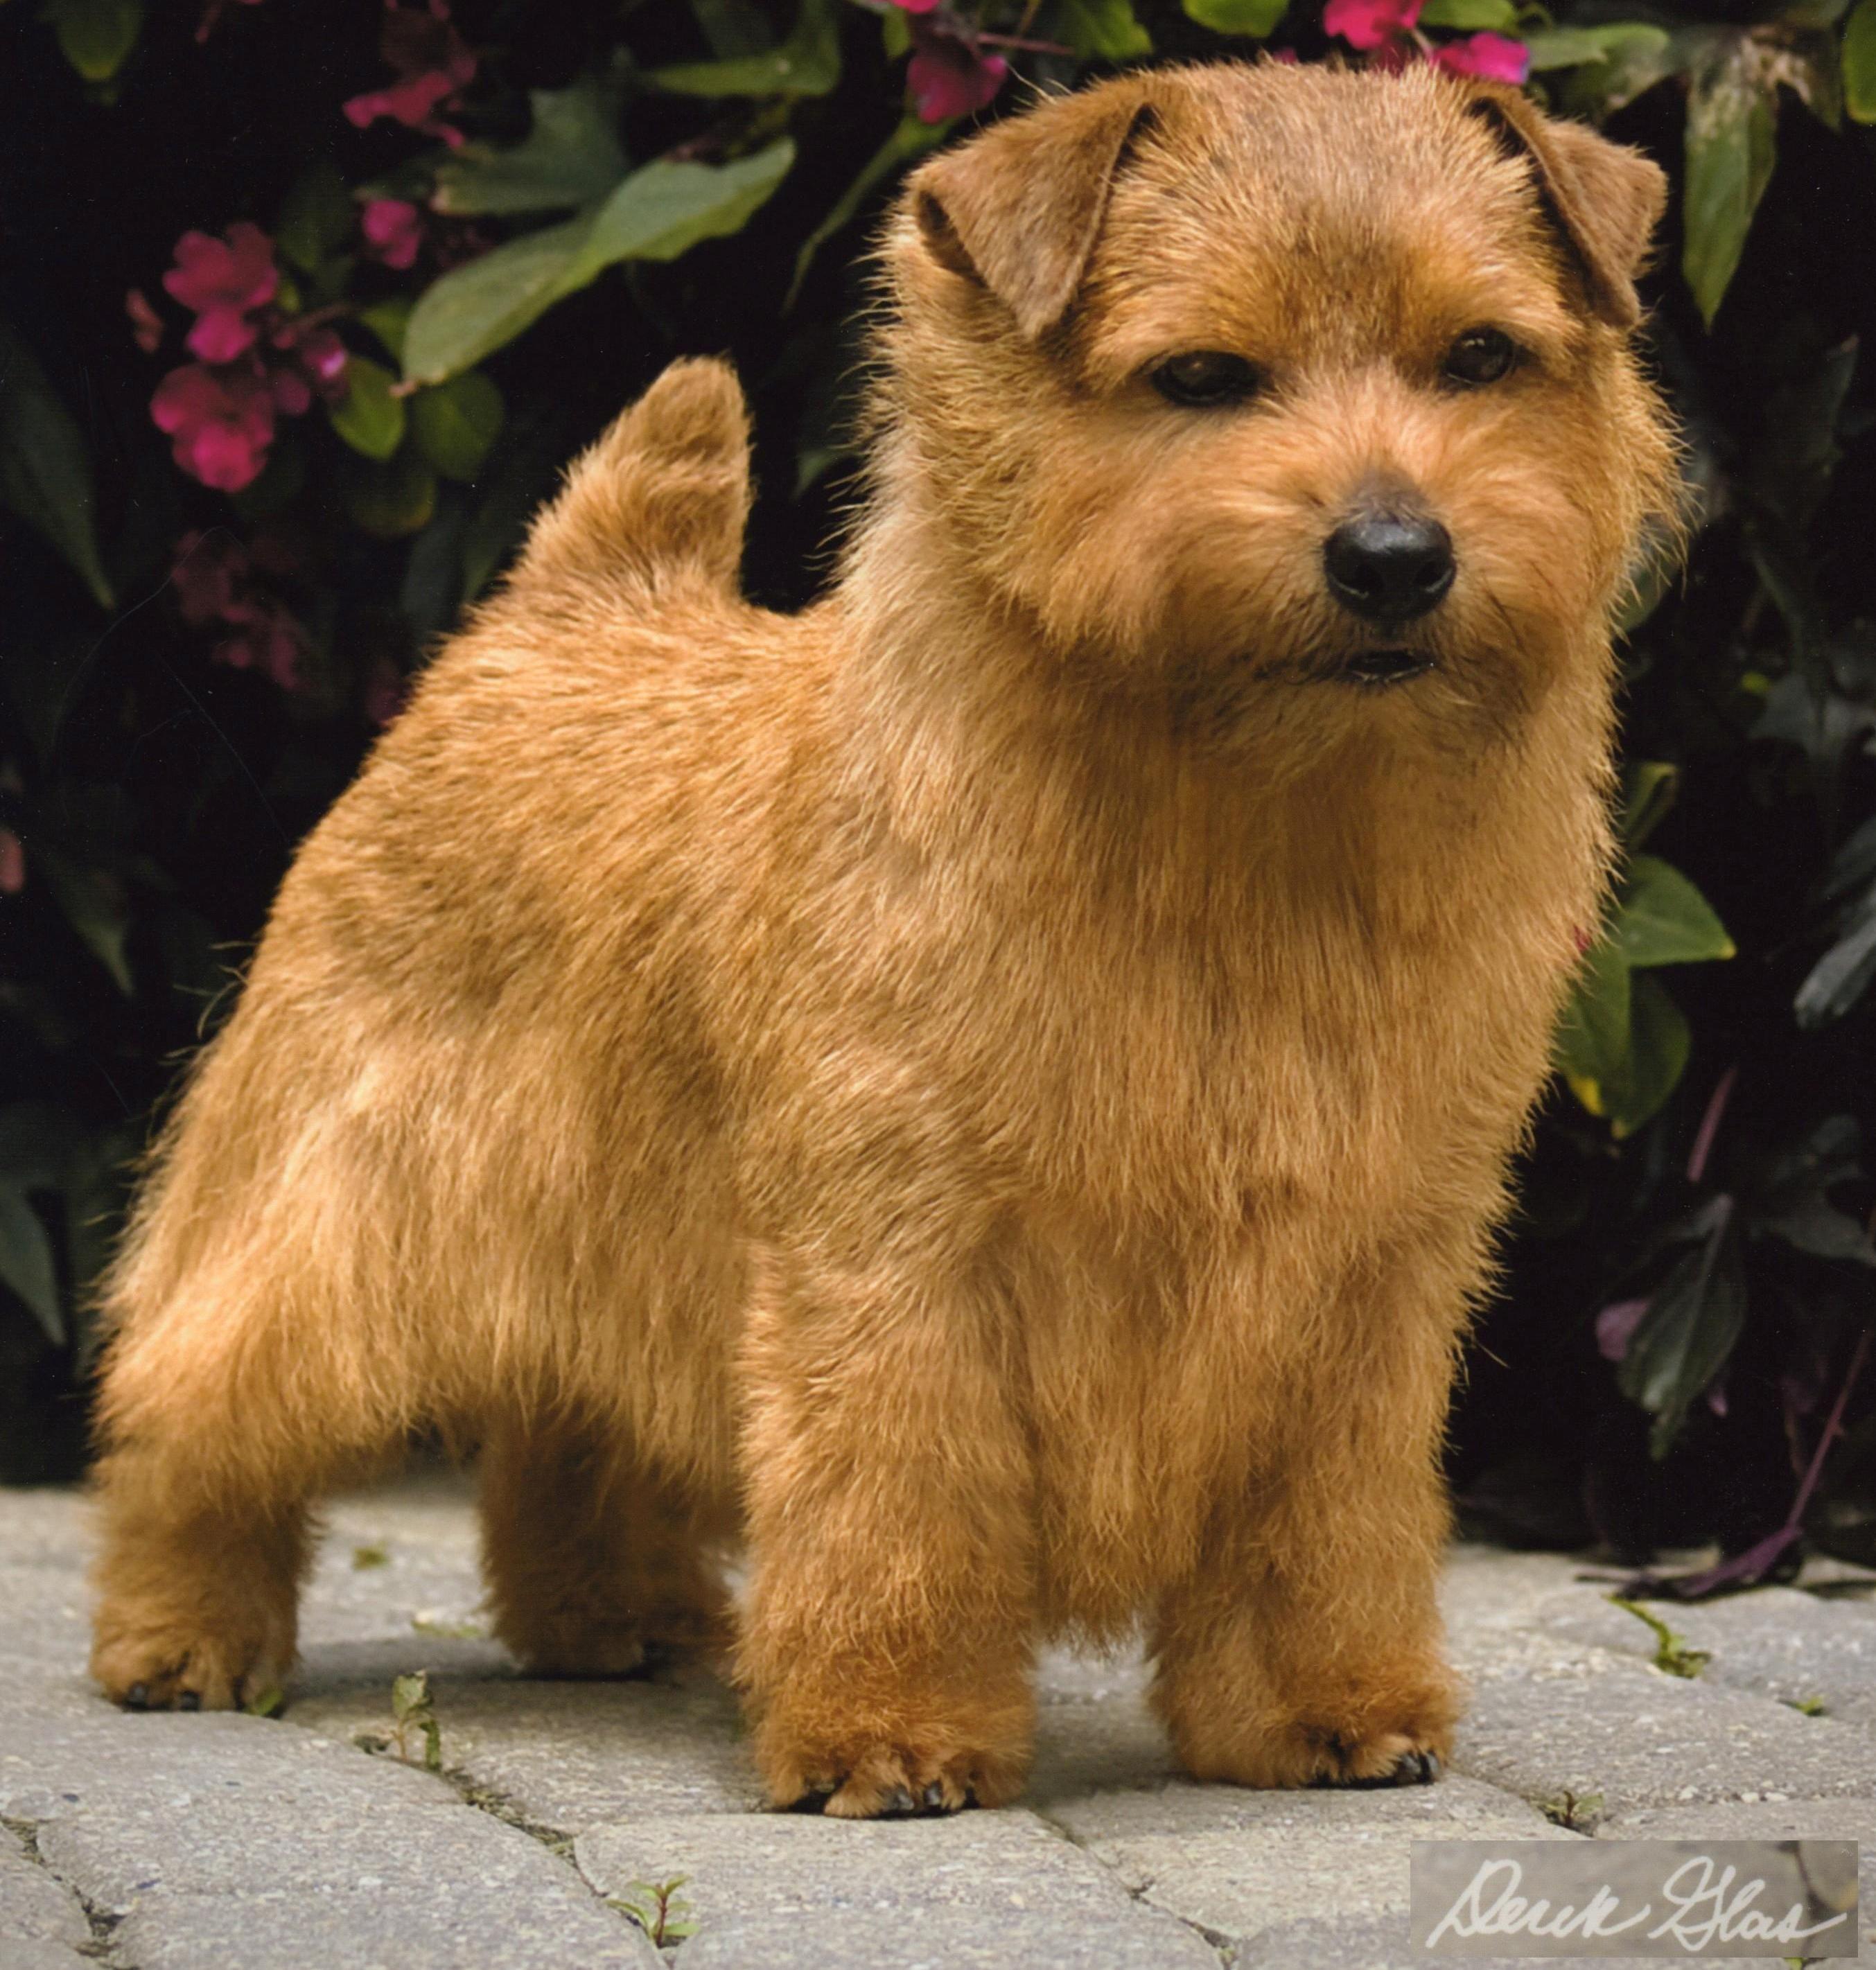 Desktop Wallpapers Cute Norfolk Terrier Photos In High Quality And Resolution Norfolk Terrier Norwich Terrier Puppy Norwich Terrier